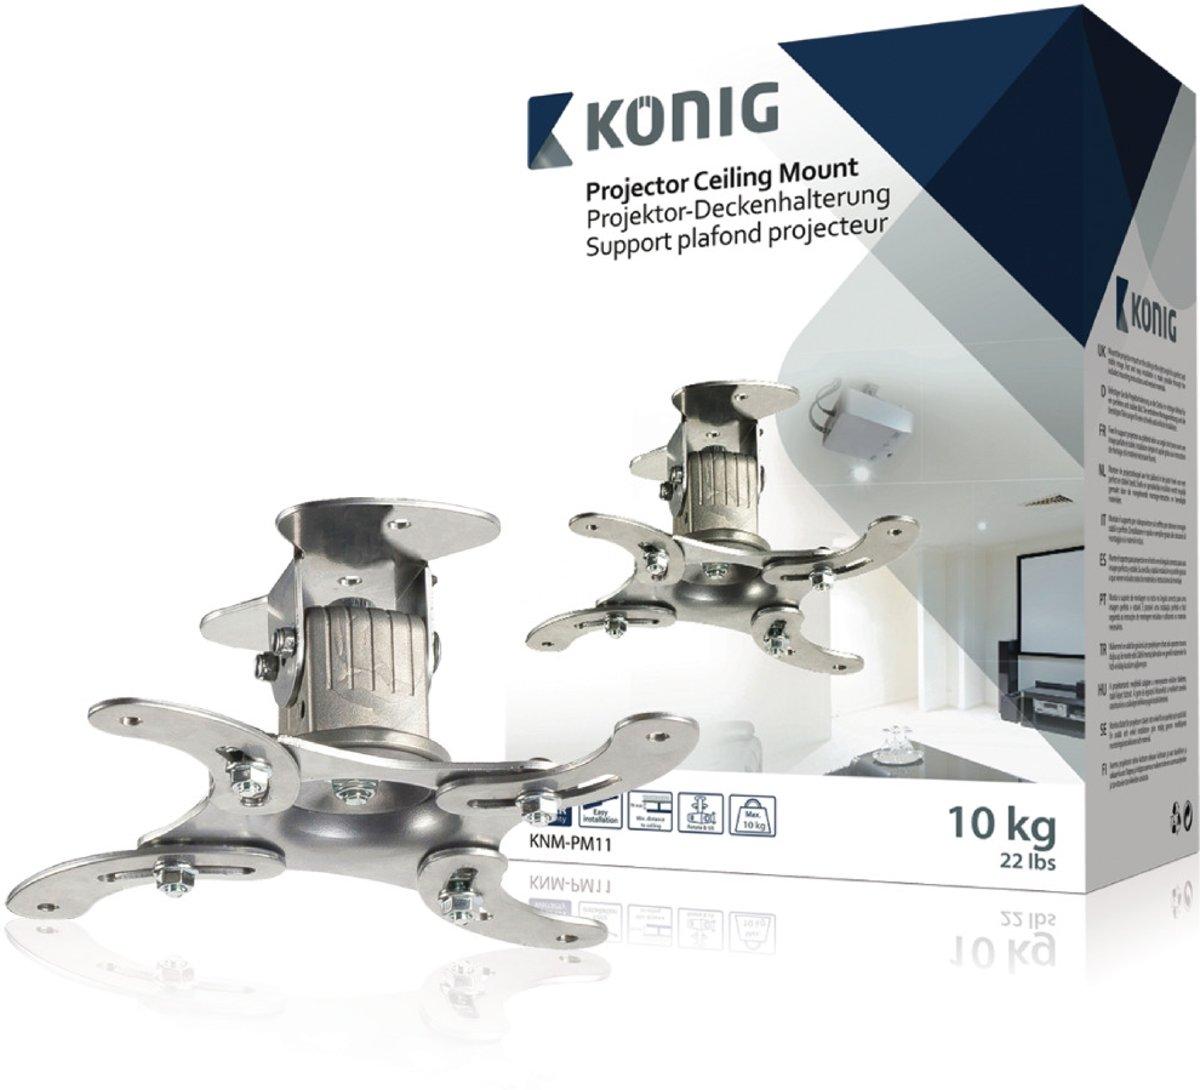 König Knm-pm11 Projectorplafondbeugel 10 Kg / 22 Lbs Zilver kopen